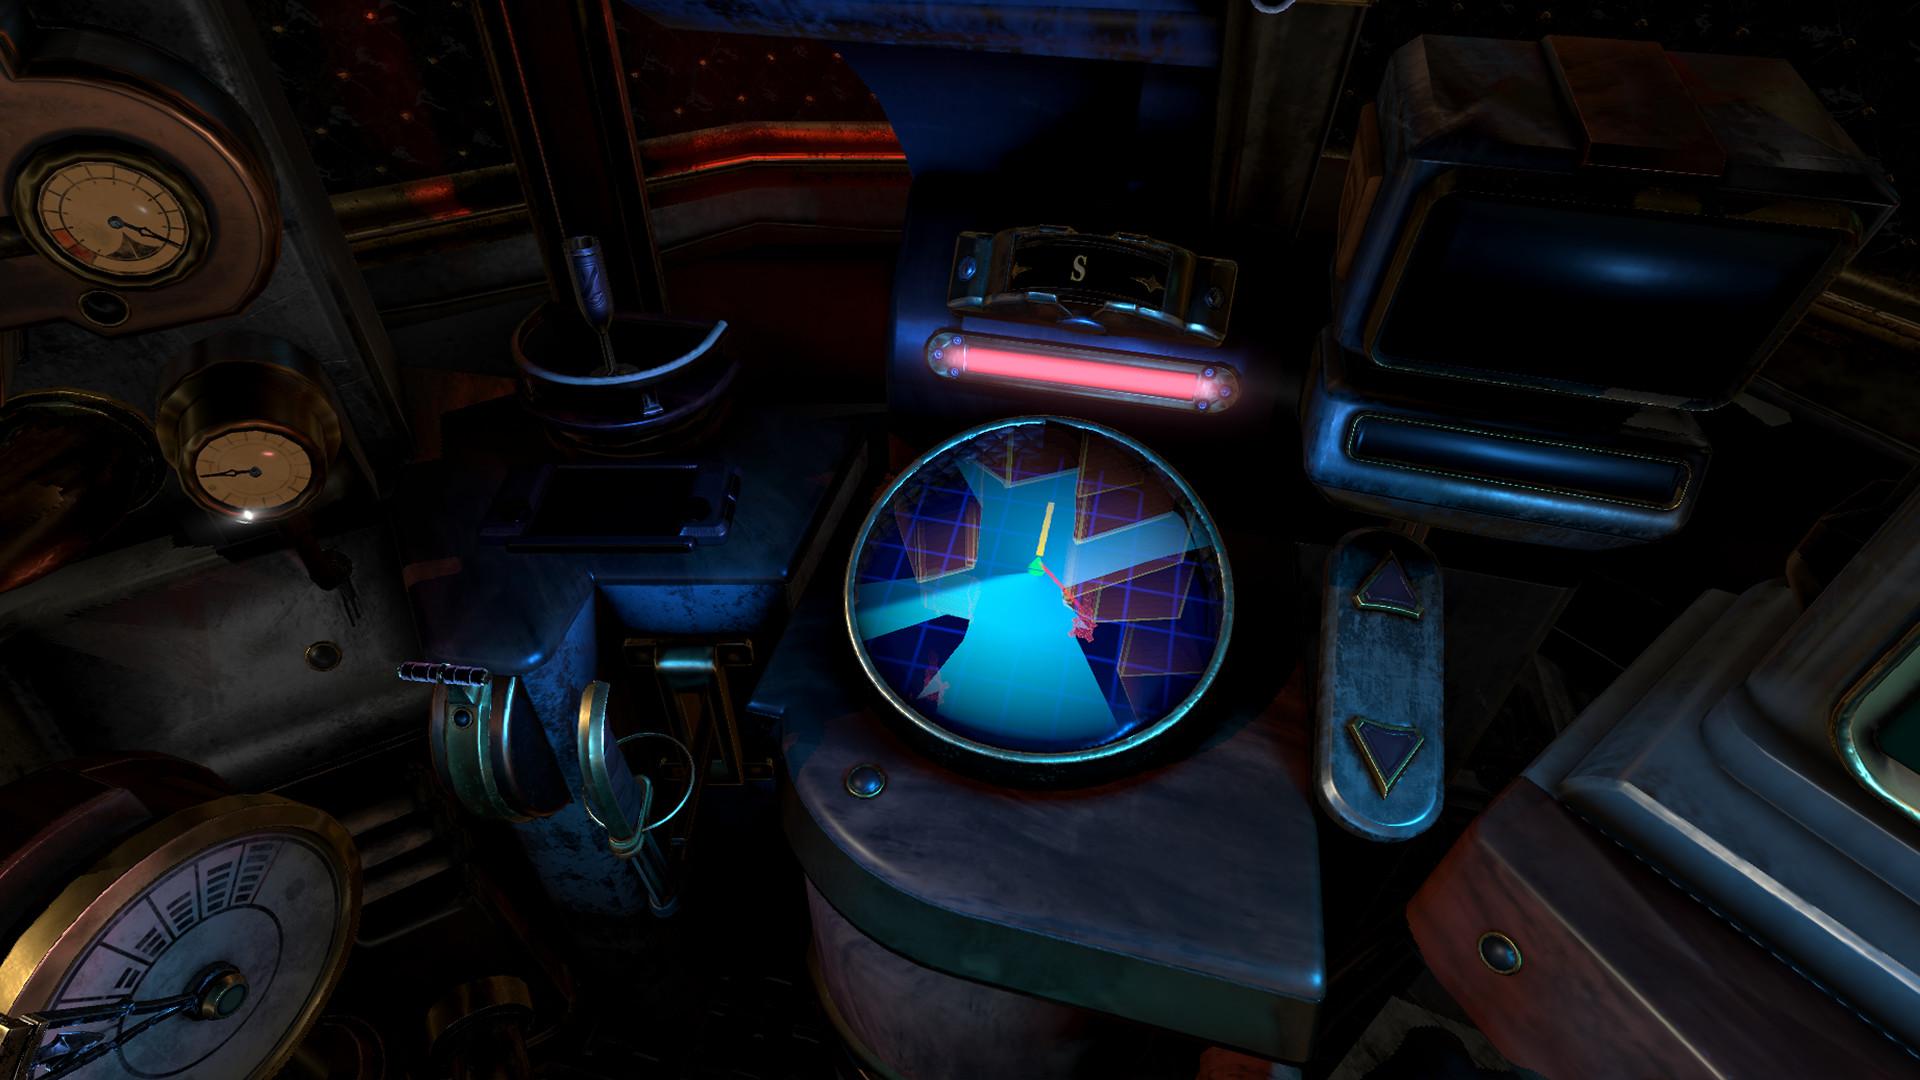 Oculus Quest 游戏《A Rogue Escape》盗窃逃亡插图(3)